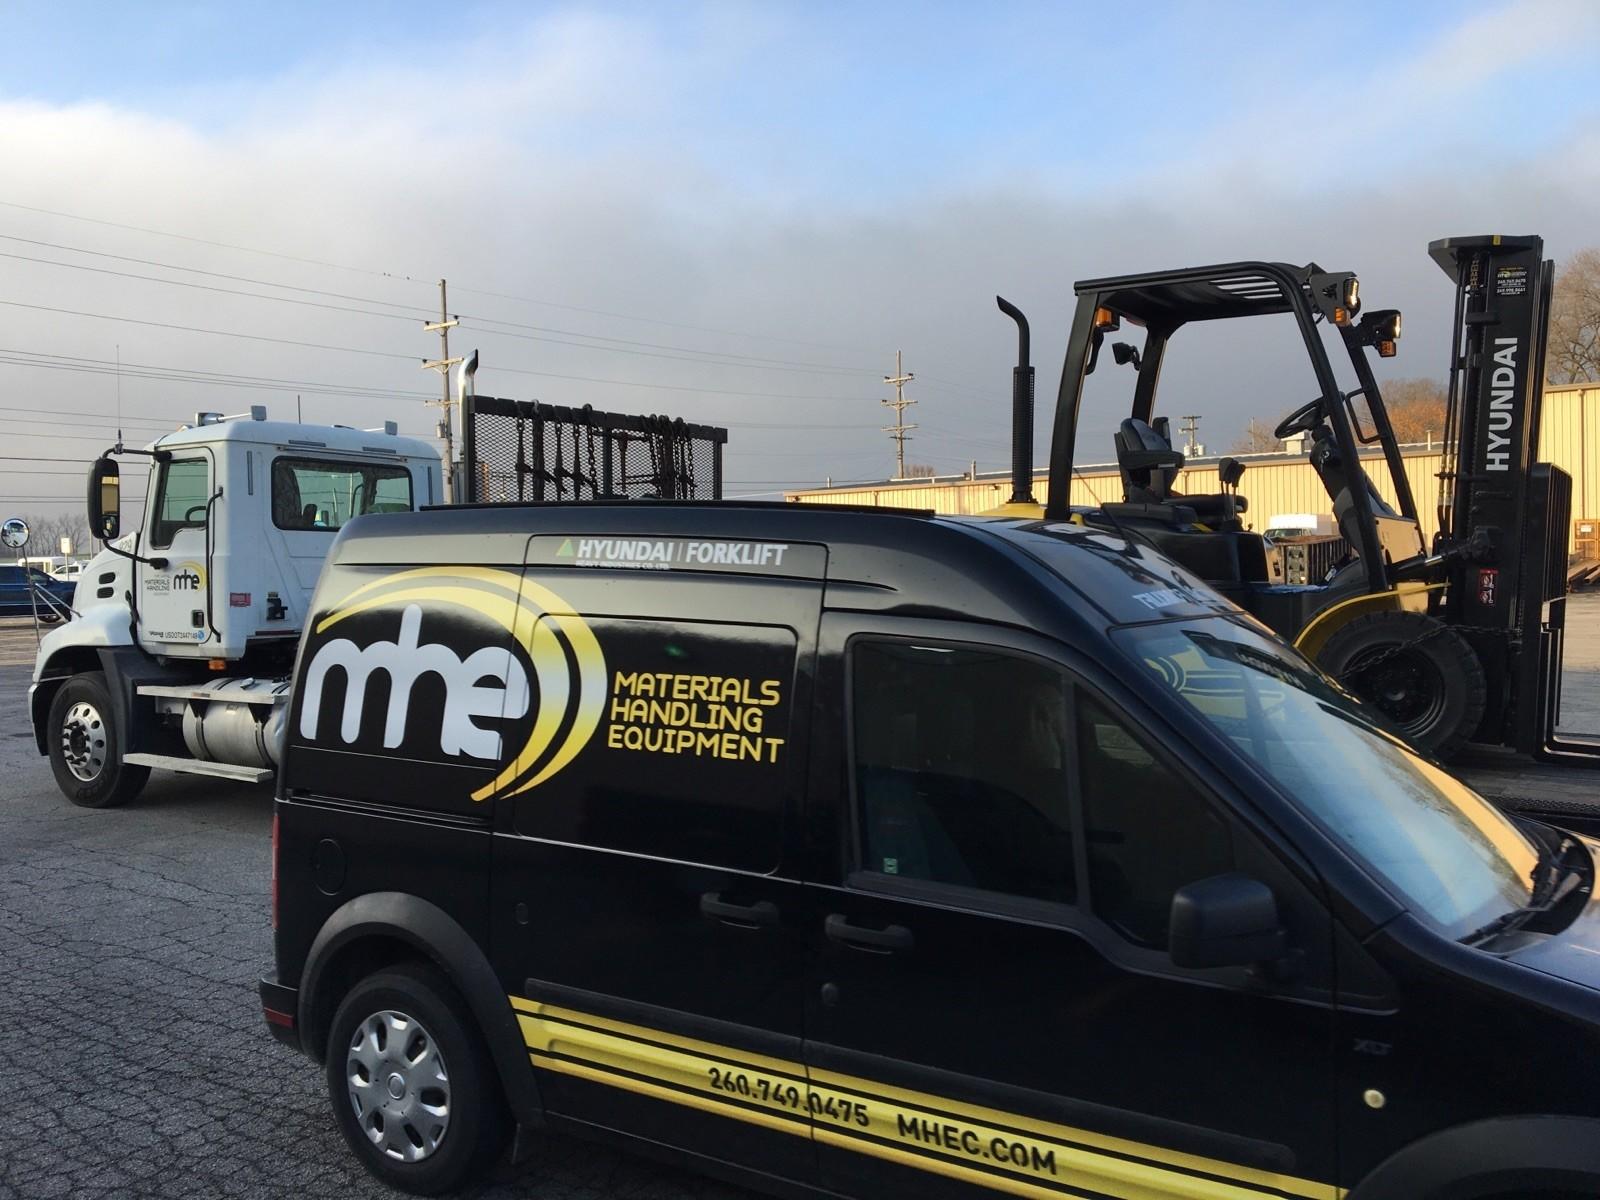 MHE - Materials Handling Equipment | LinkedIn